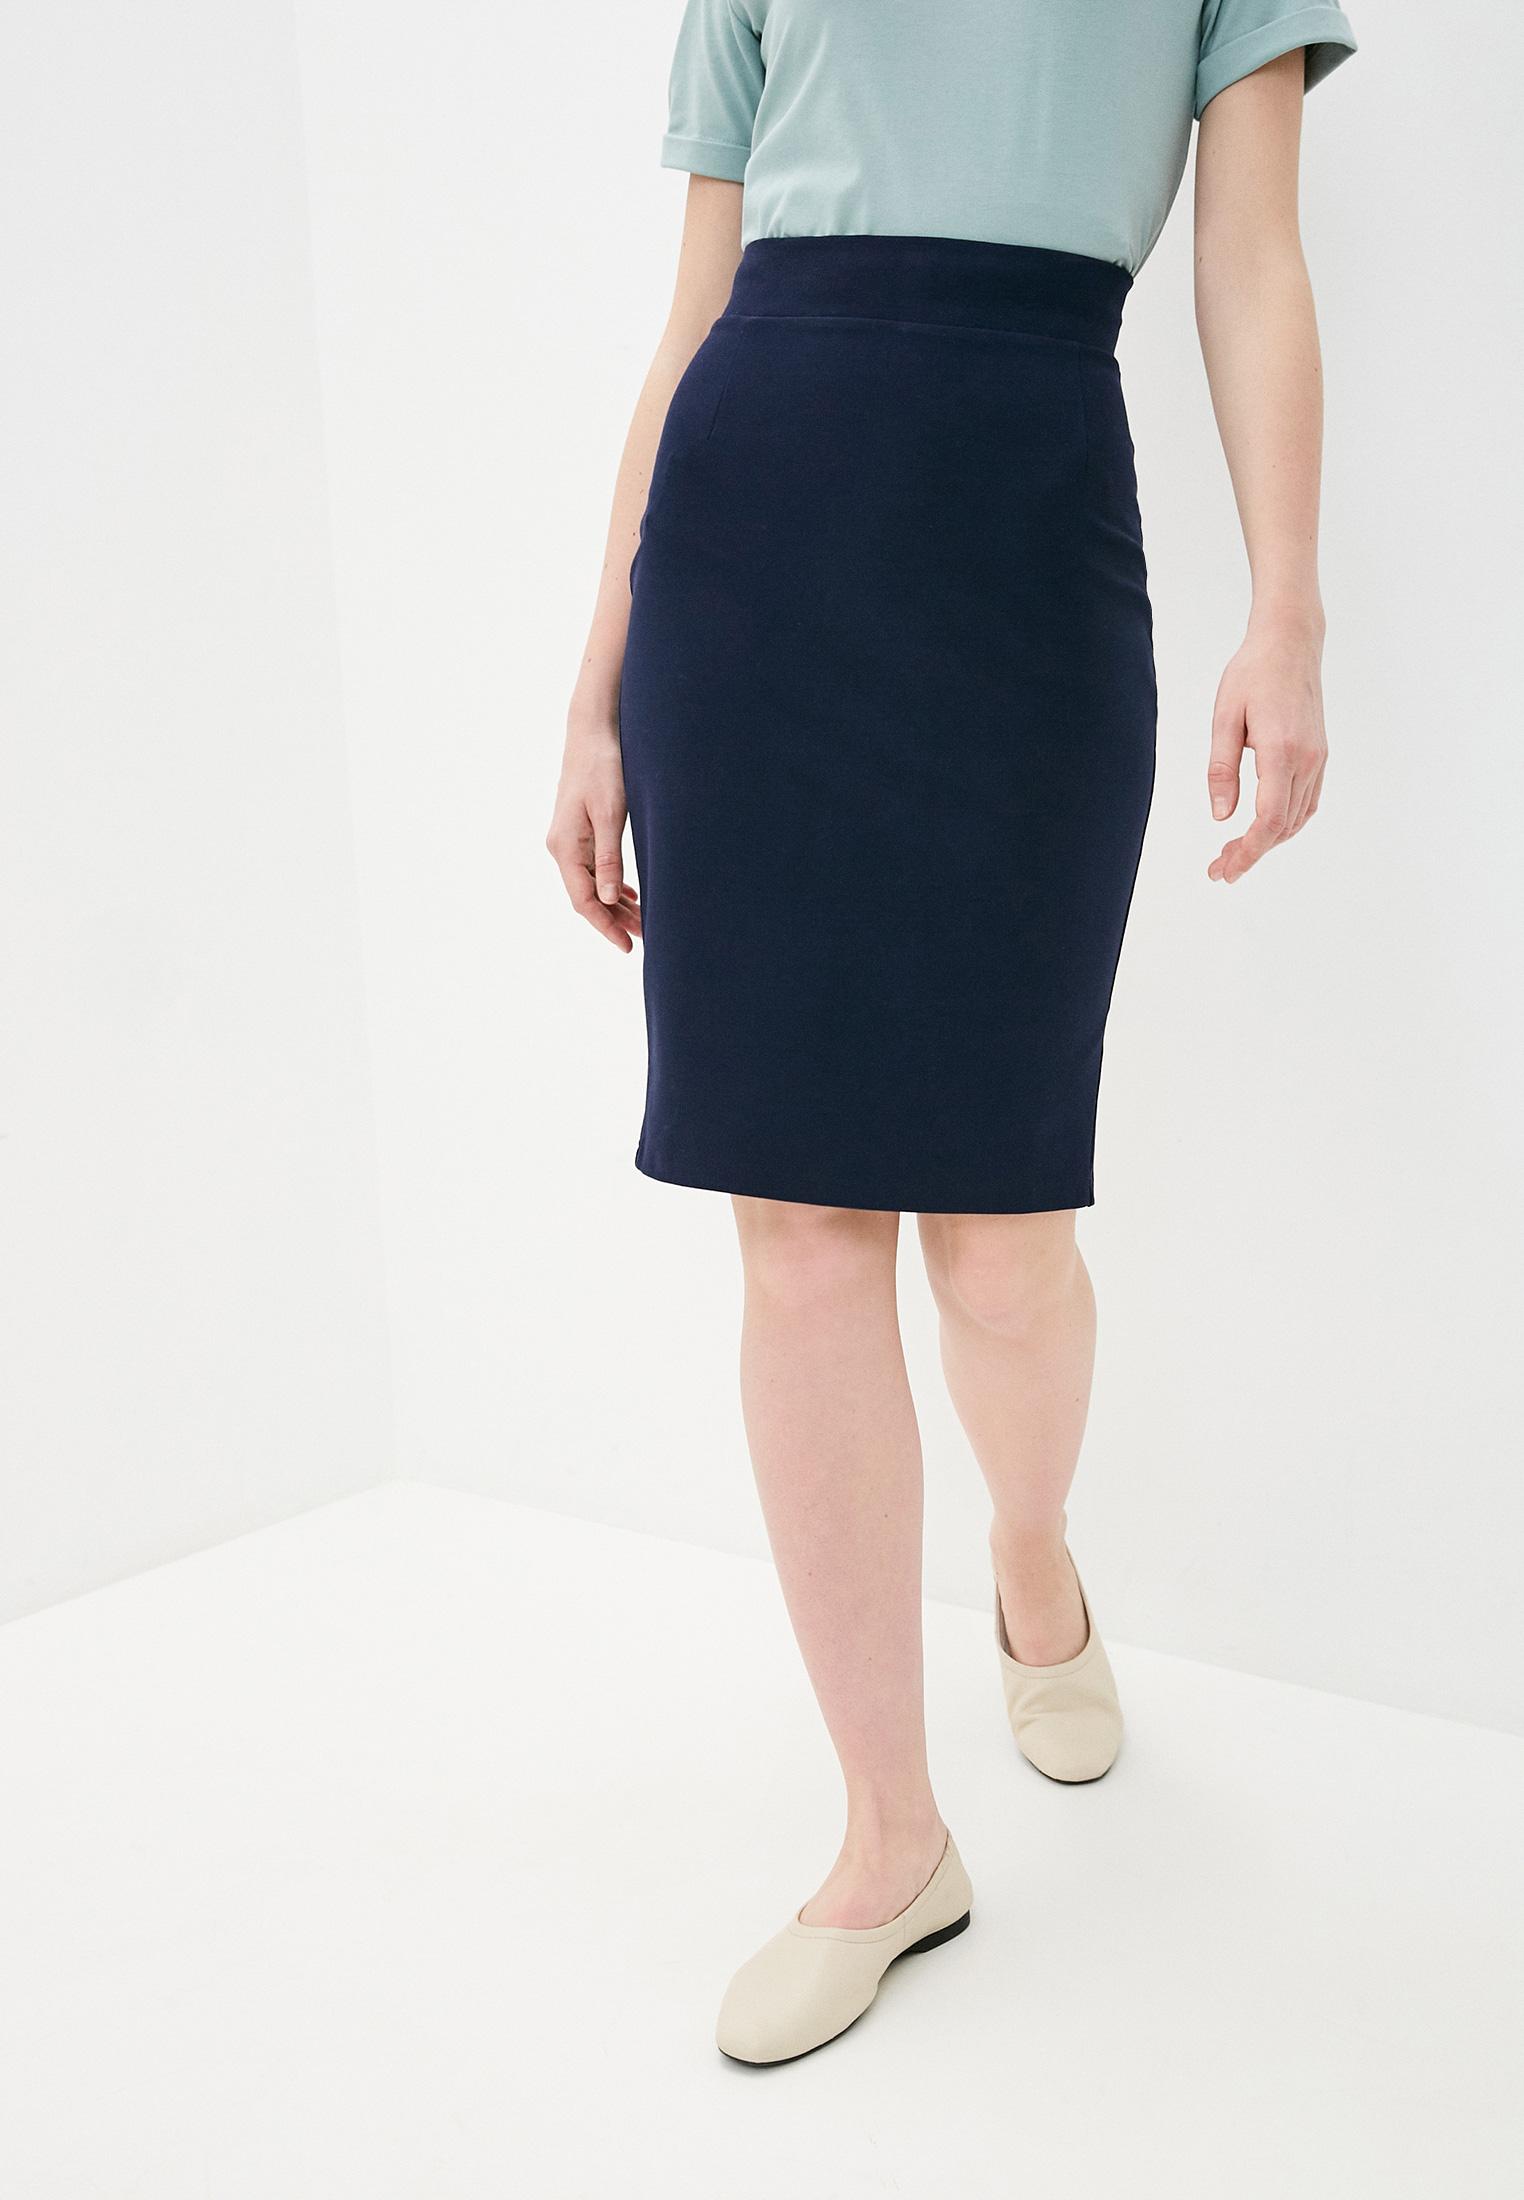 Прямая юбка Toku Tino TT8518025/